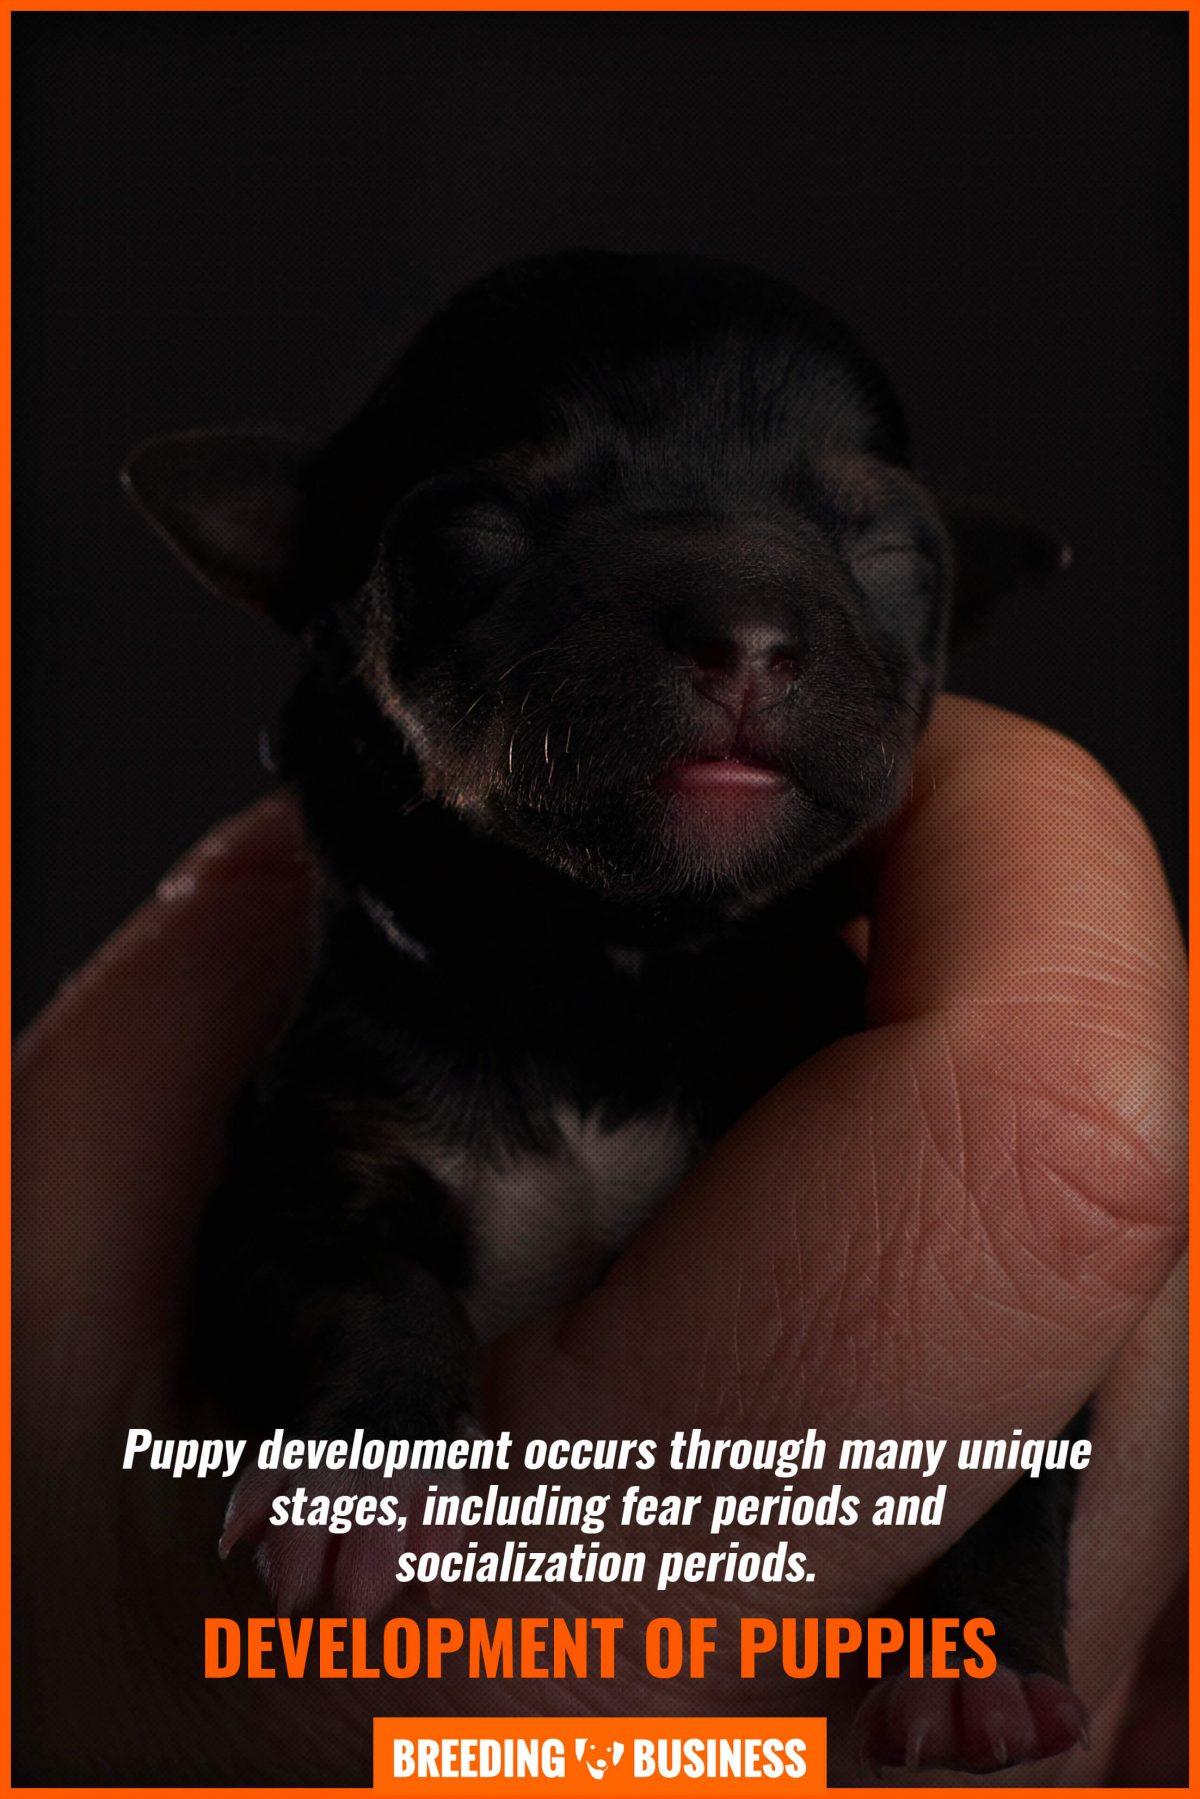 development of puppies